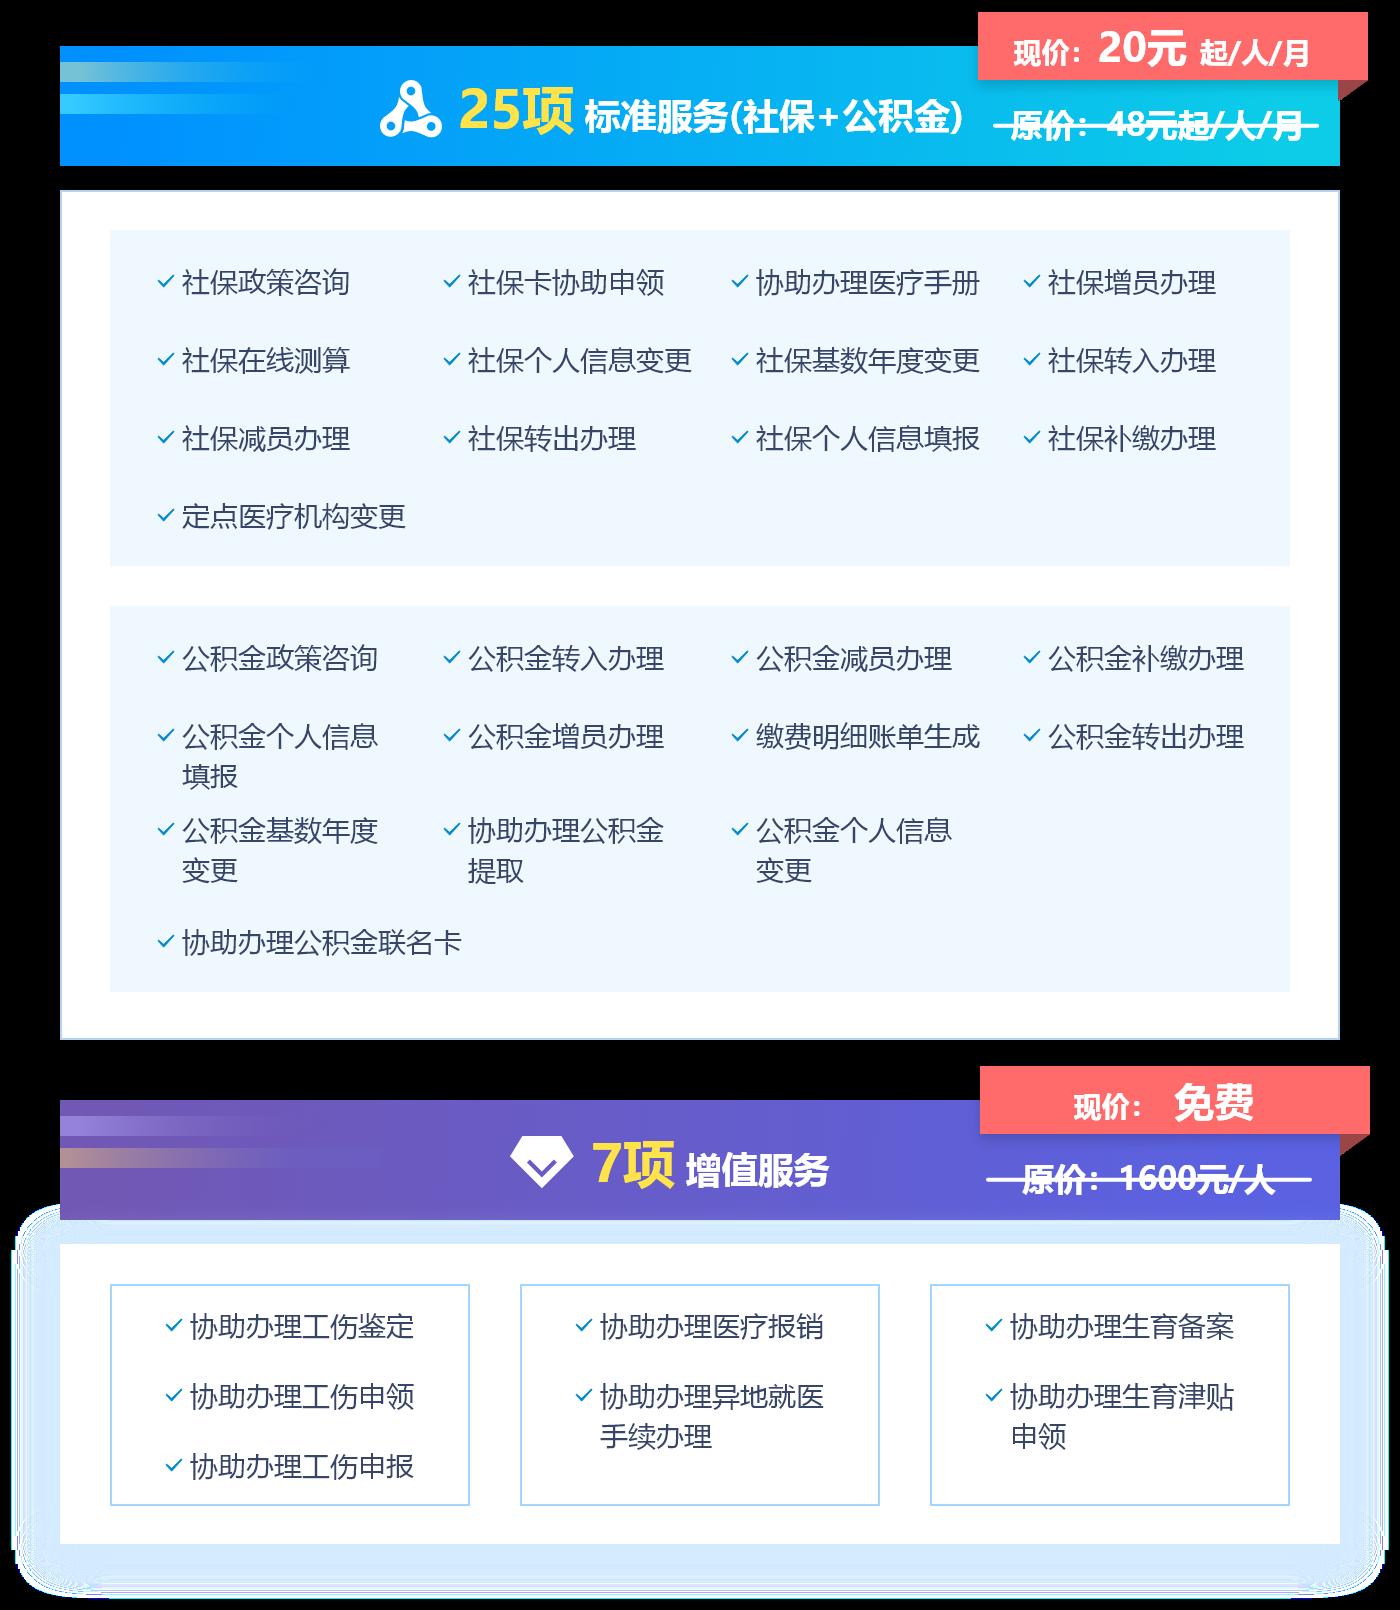 365bet中文官方网站企业社保代缴